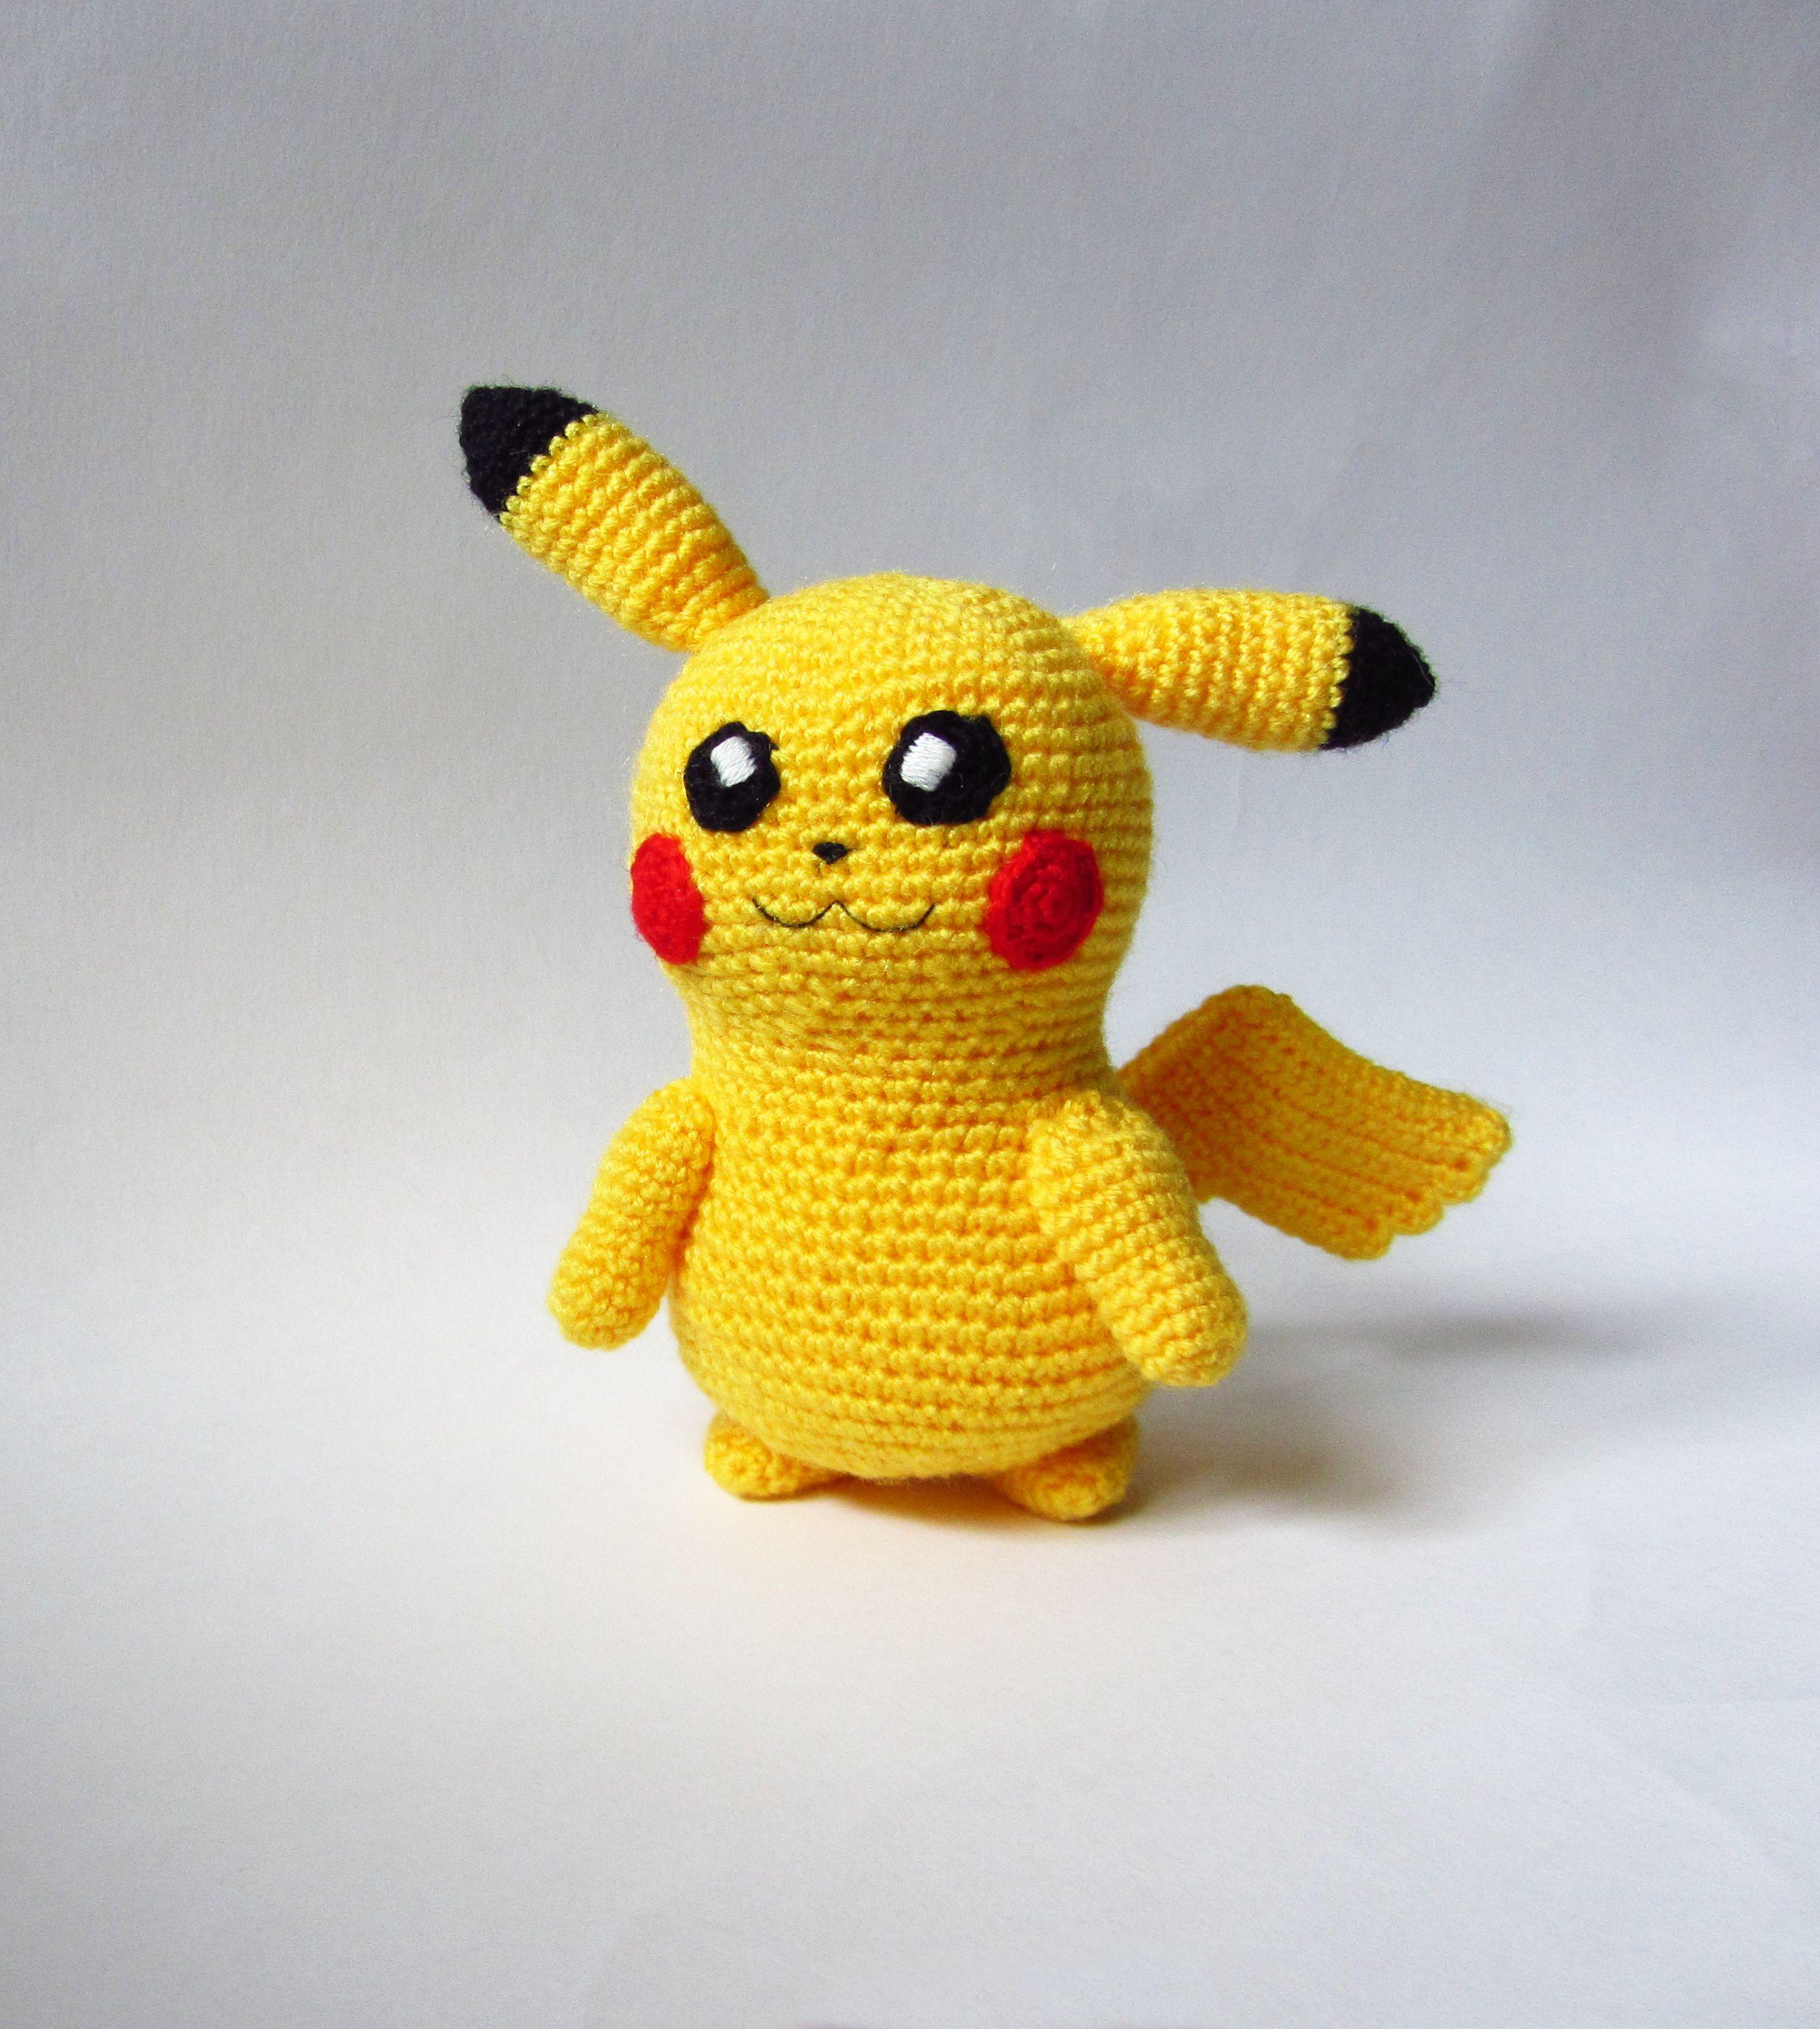 handmade аниме покемон pokemon pikachu игрушкавязаная пикачу ручнаяработа